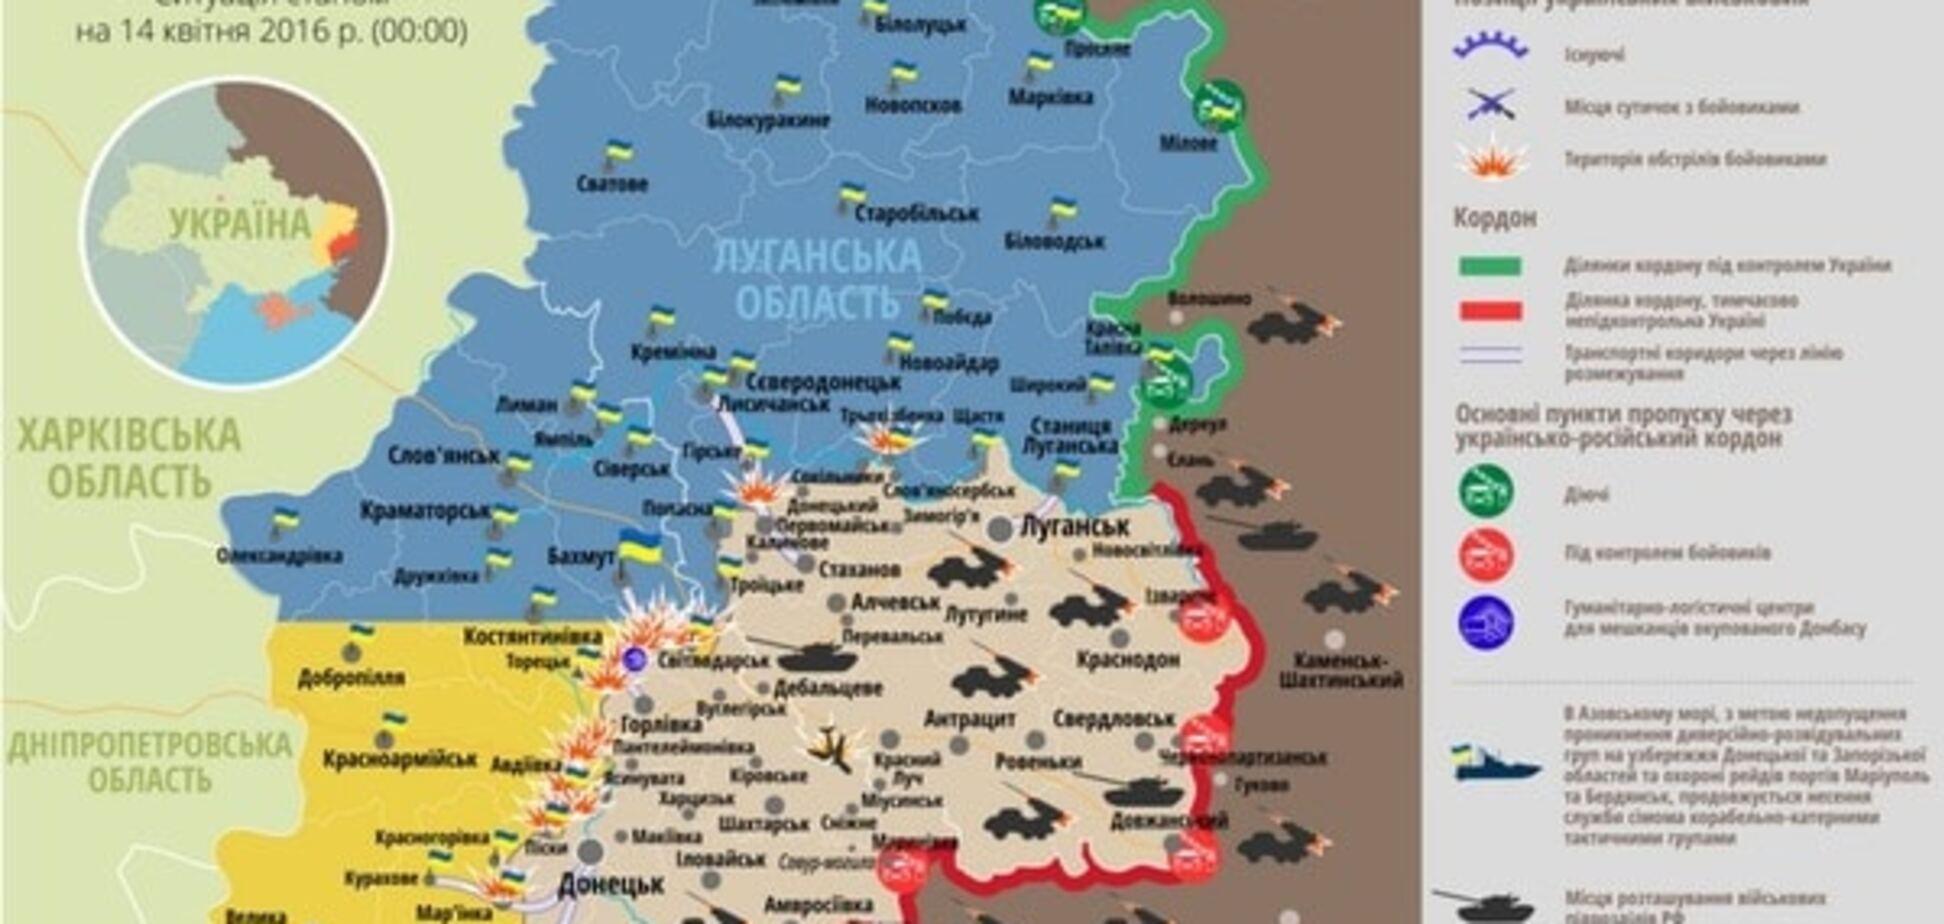 Сили АТО зазнали втрат на Донбасі: опублікована карта - 14 квітня 2016